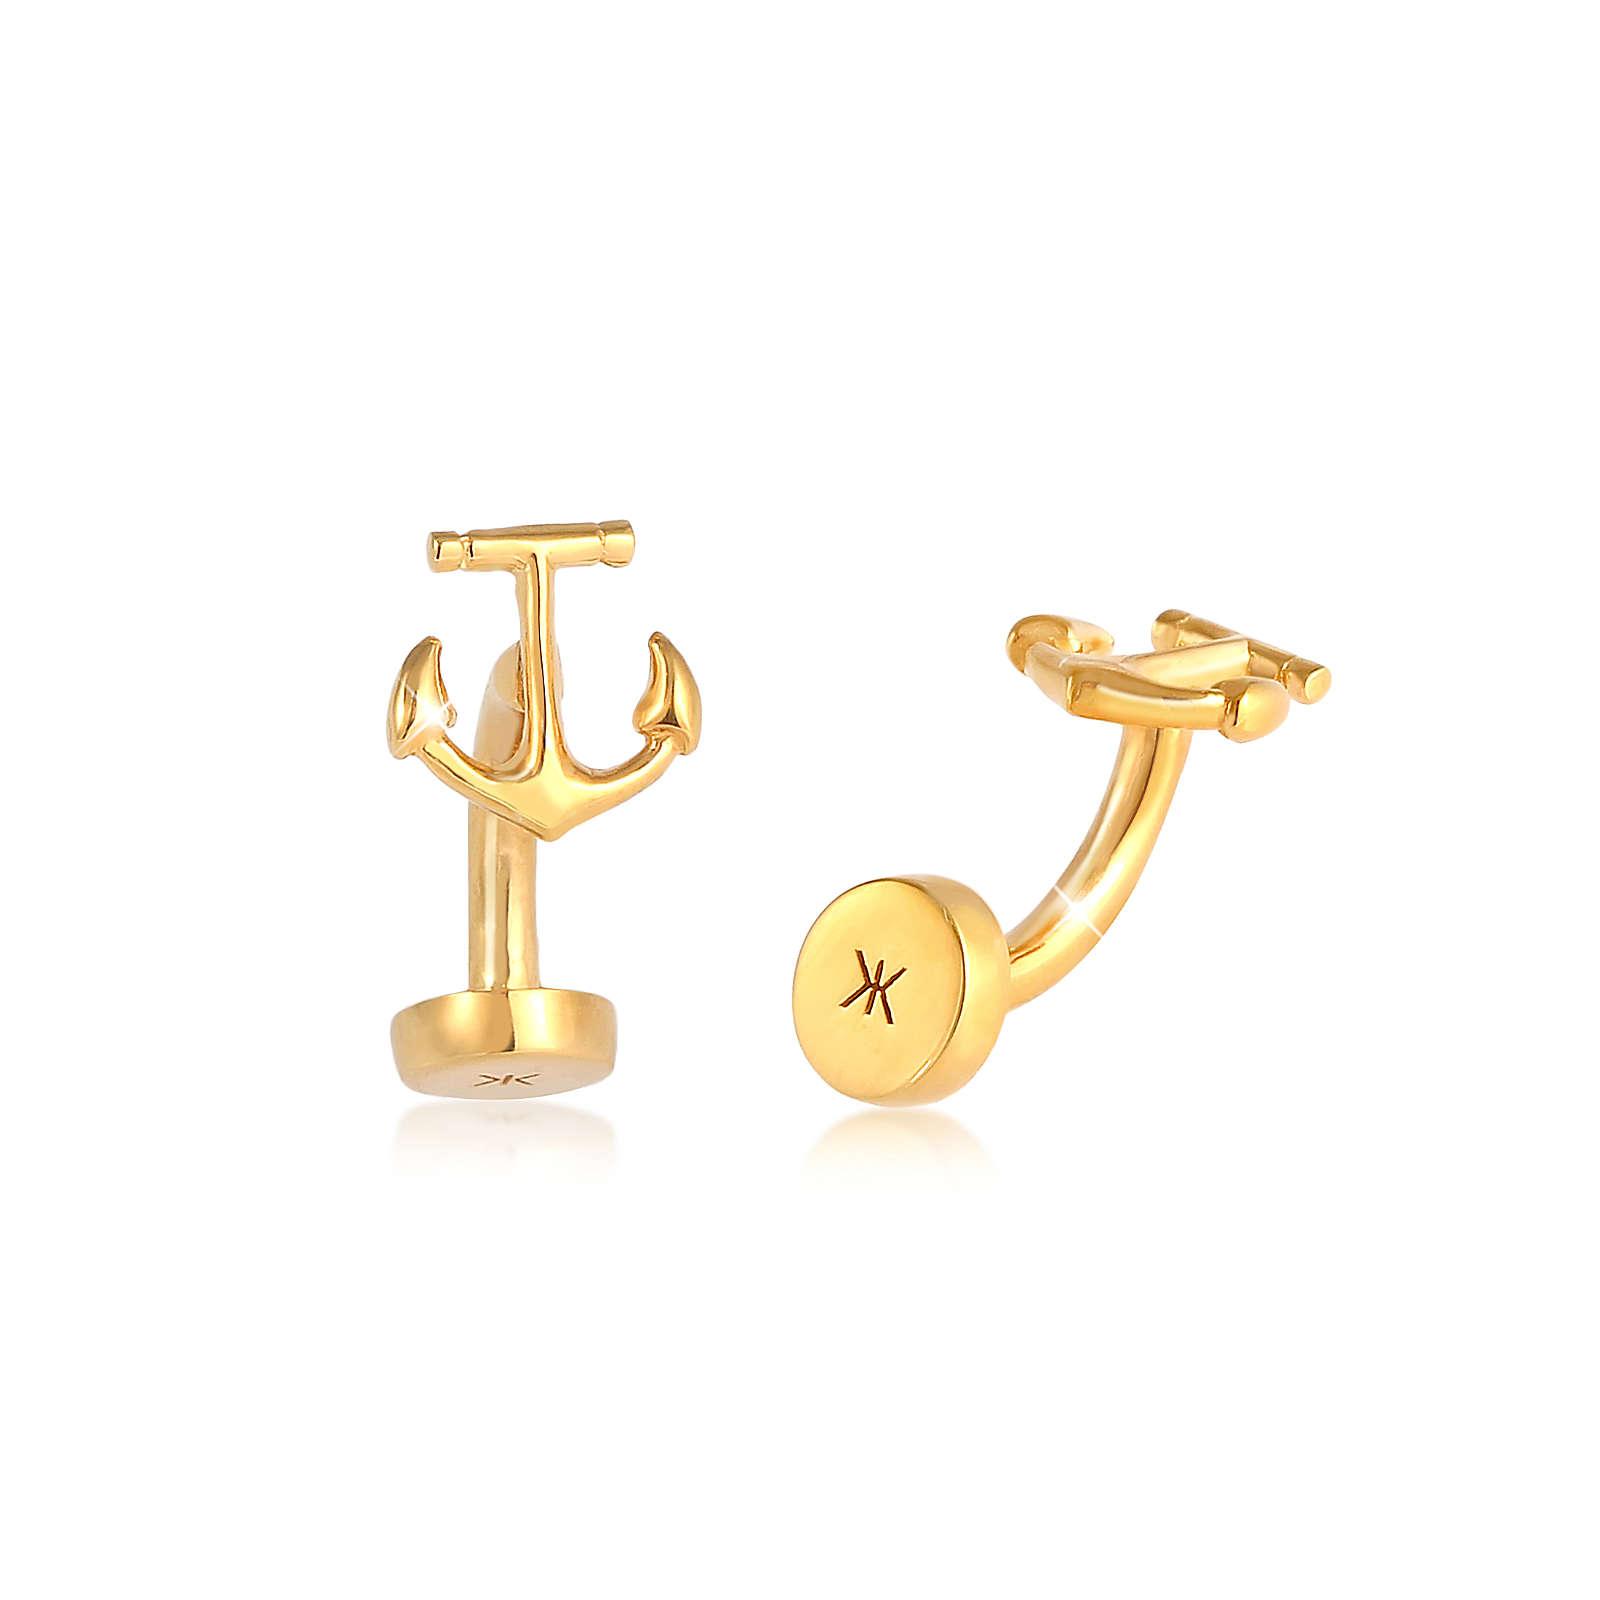 KUZZOI Manschettenknopf Anker Symbol Maritim Edel 925 Silber Manschettenknöpfe gold Herren